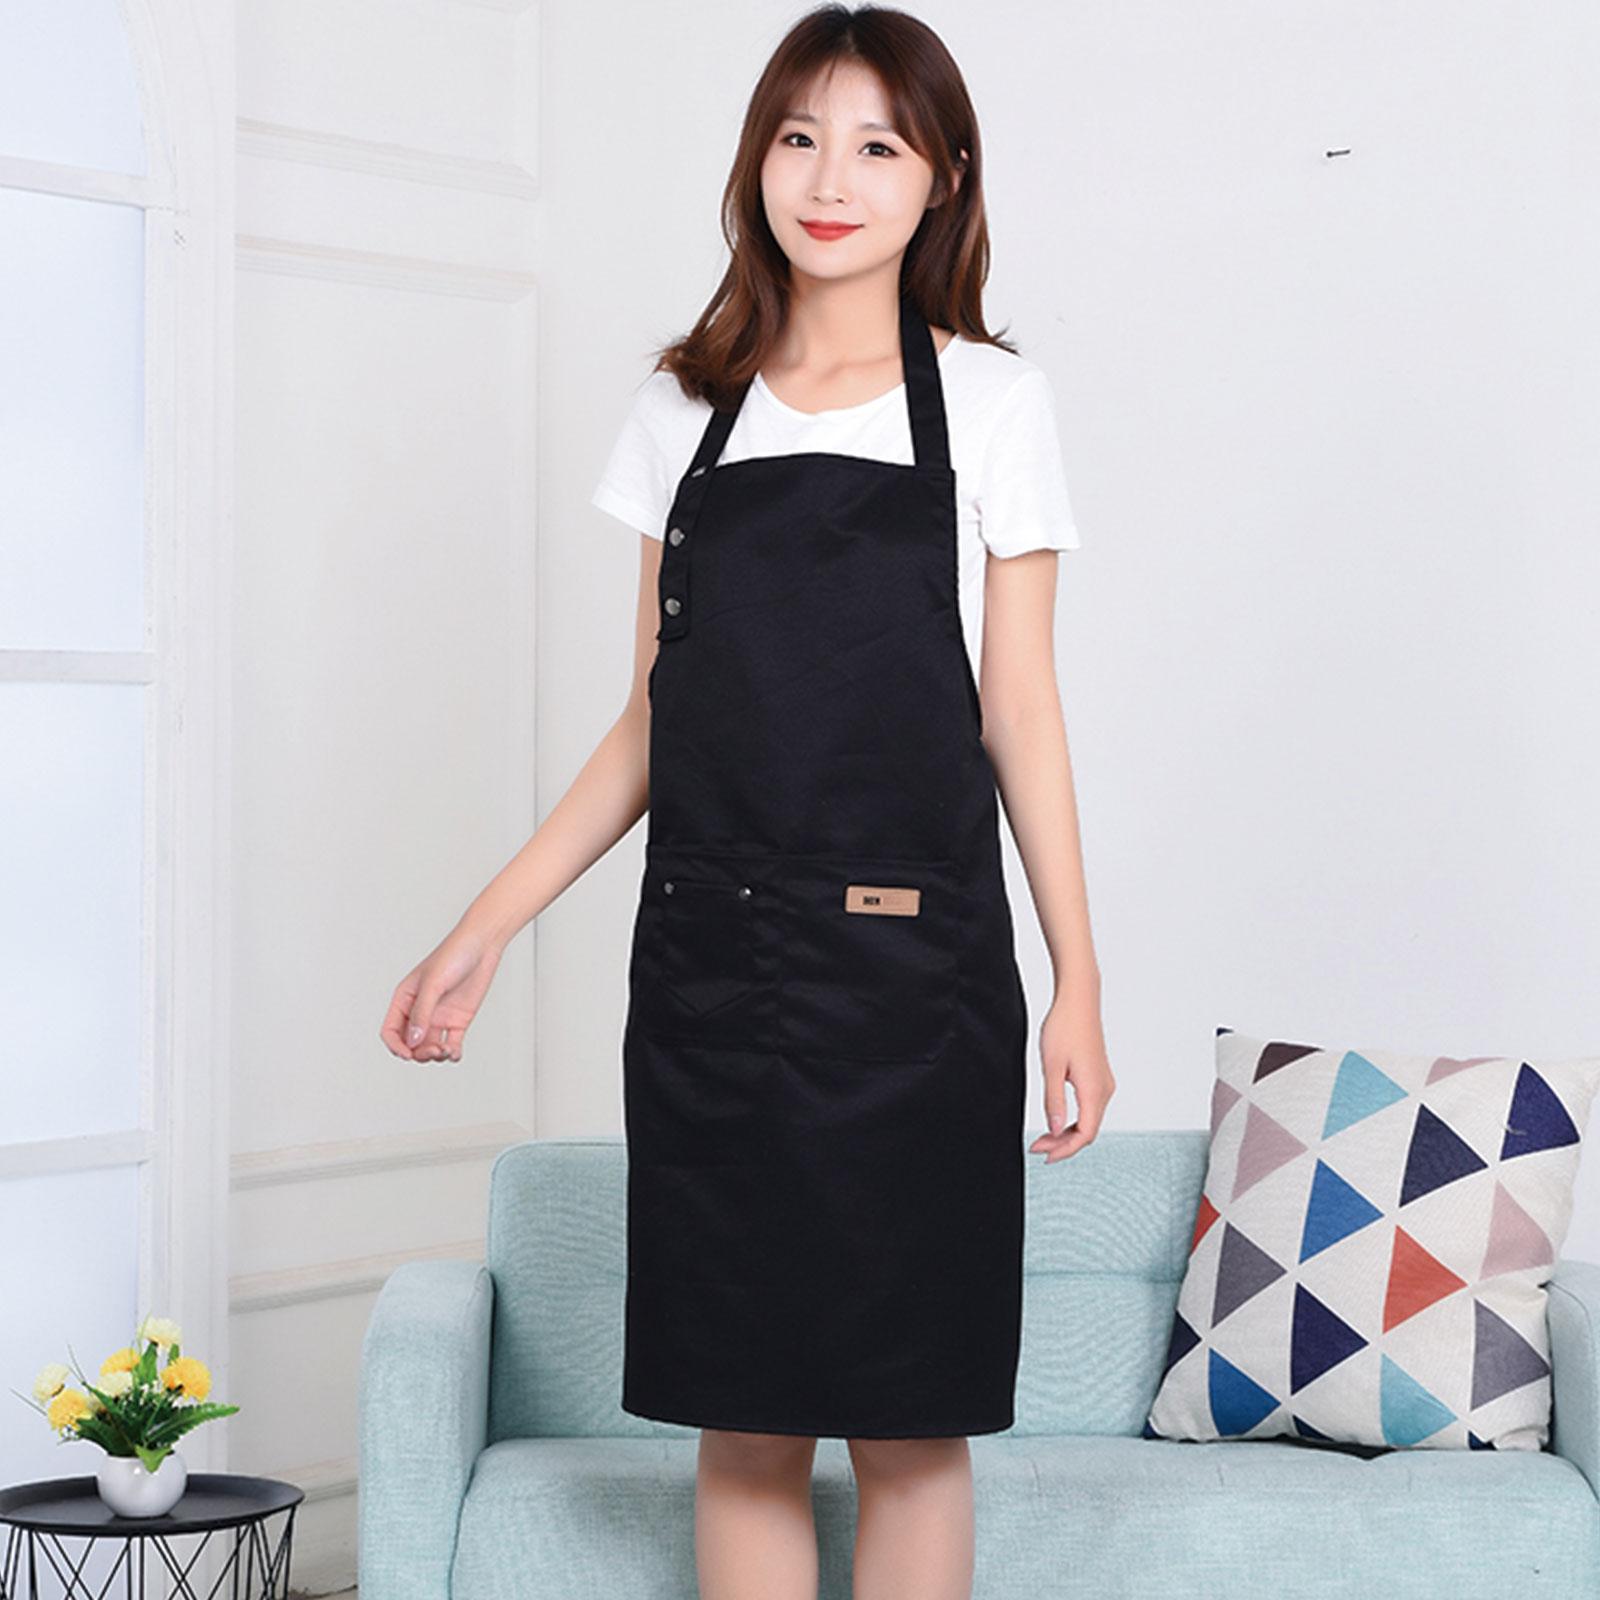 Women-Men-Waterproof-Kitchen-Bib-Aprons-Dress-Chef-BBQ-Cooking-Baking-Restaurant thumbnail 10